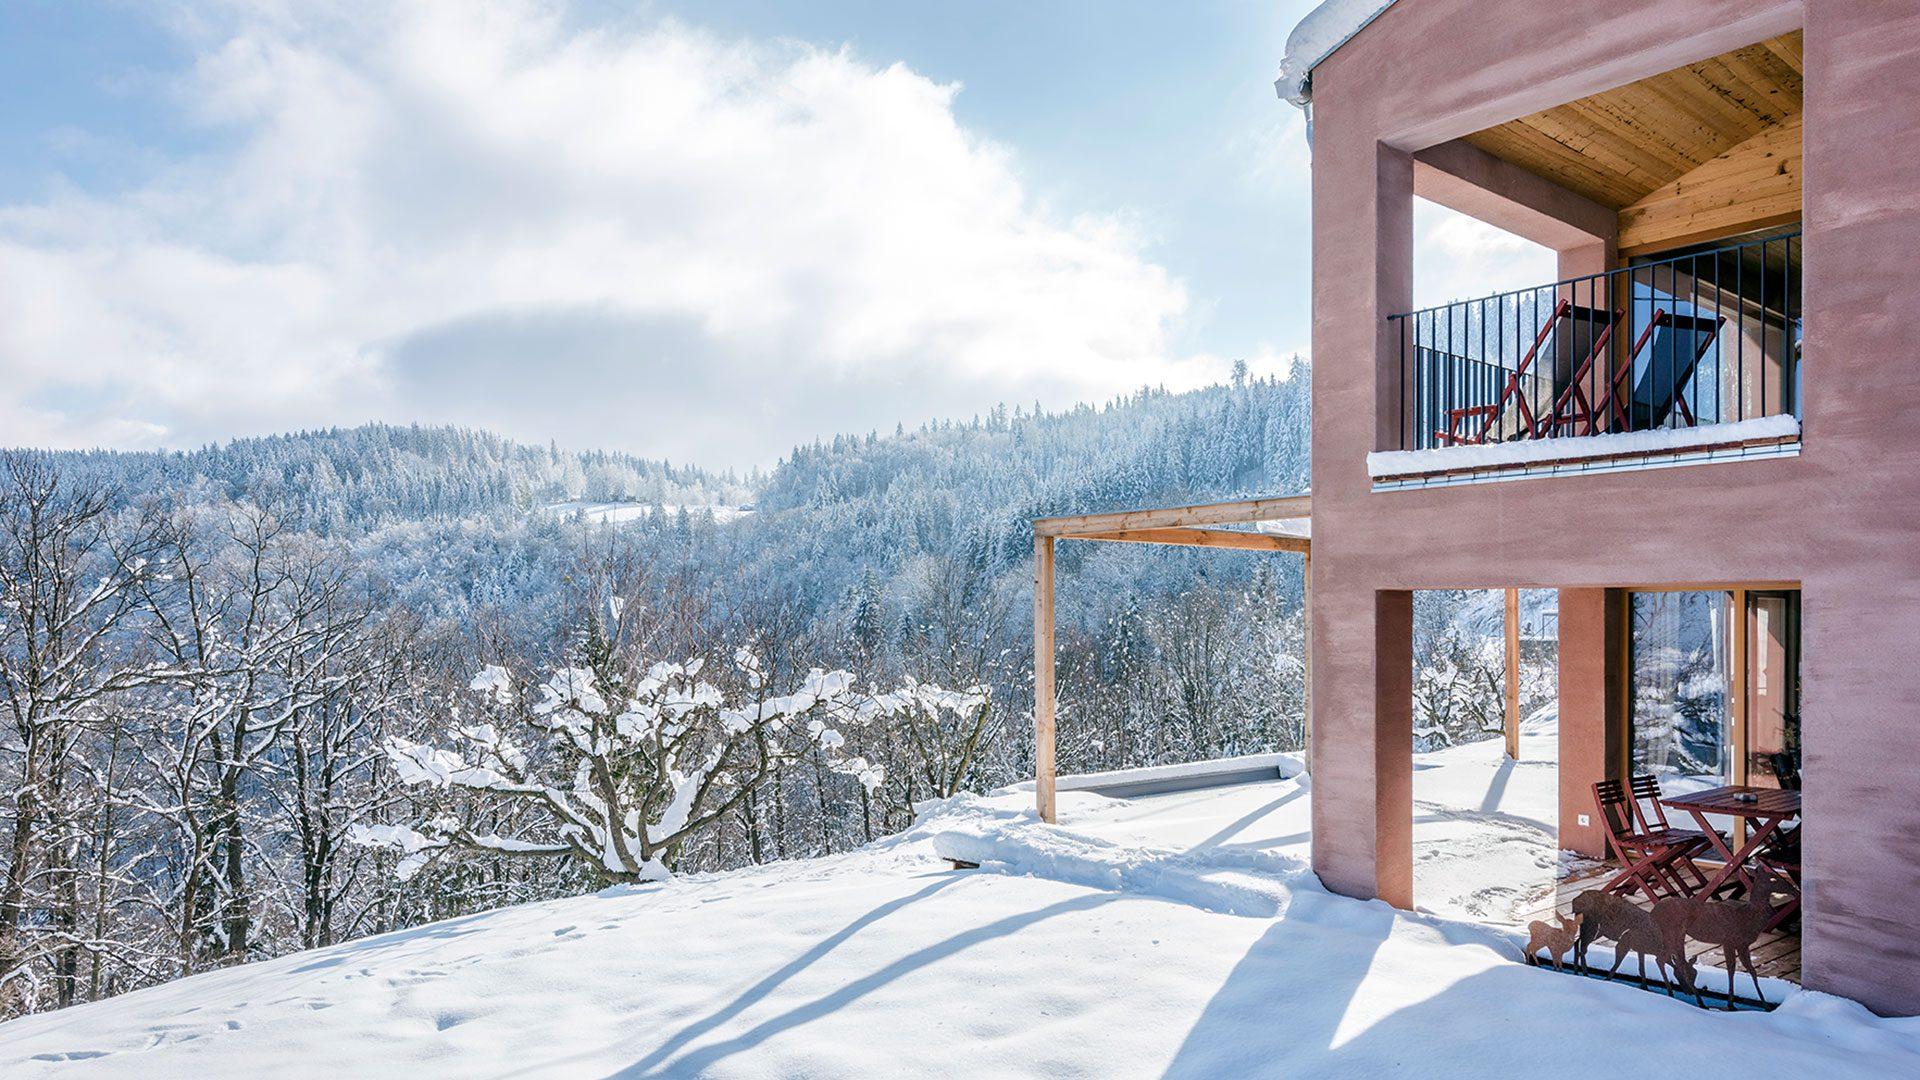 landhaus_altenbach_winter-1920x1080